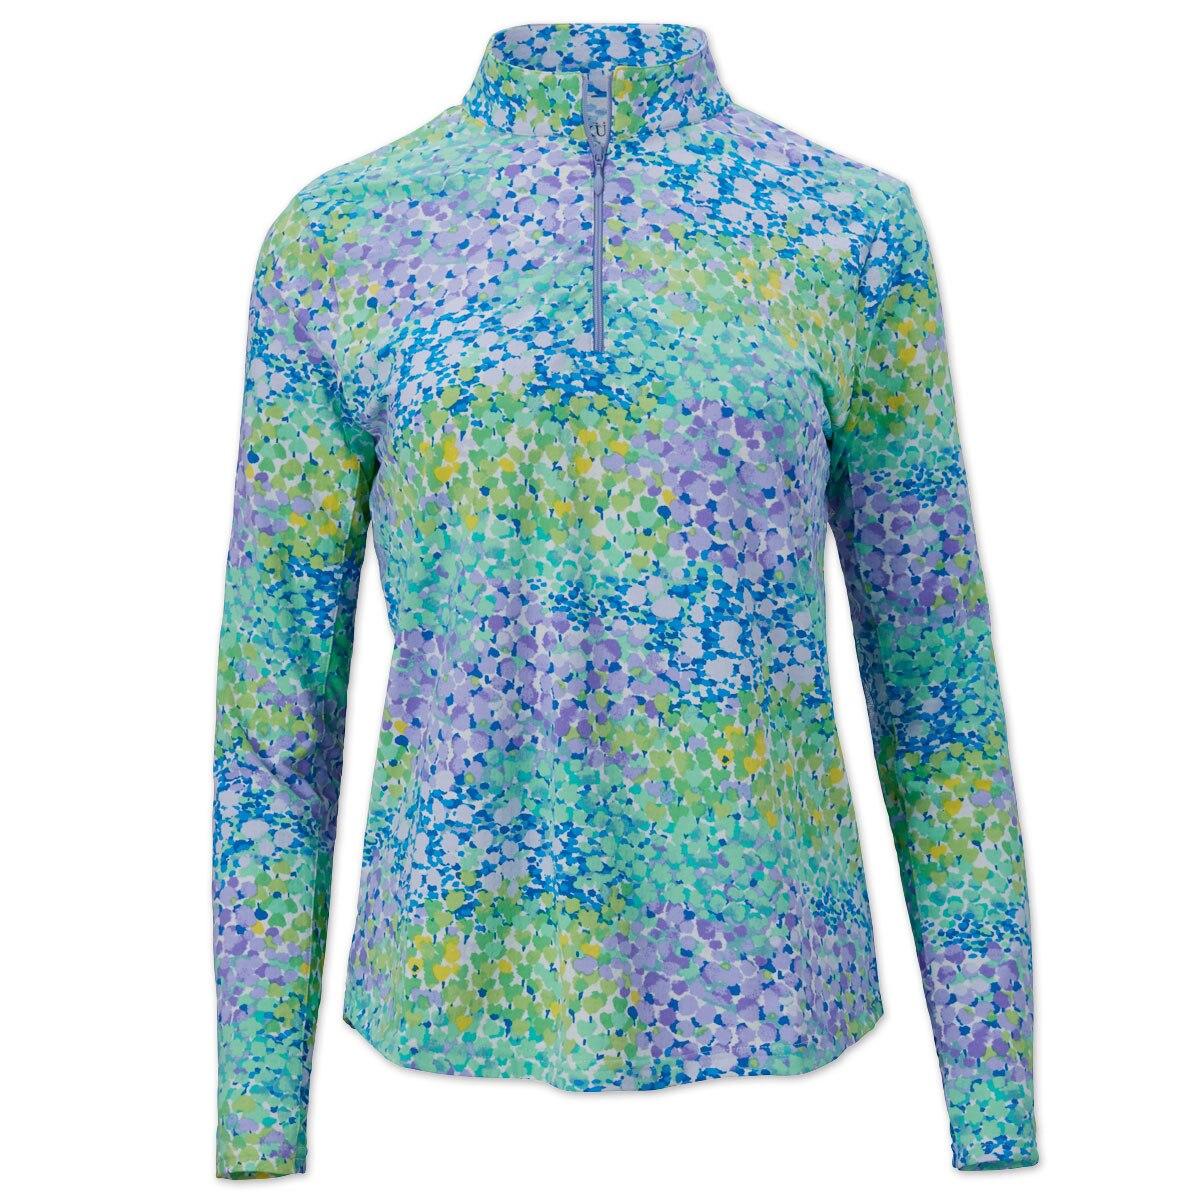 SmartPak Icikuls IceFil Printed Long Sleeve Shirt